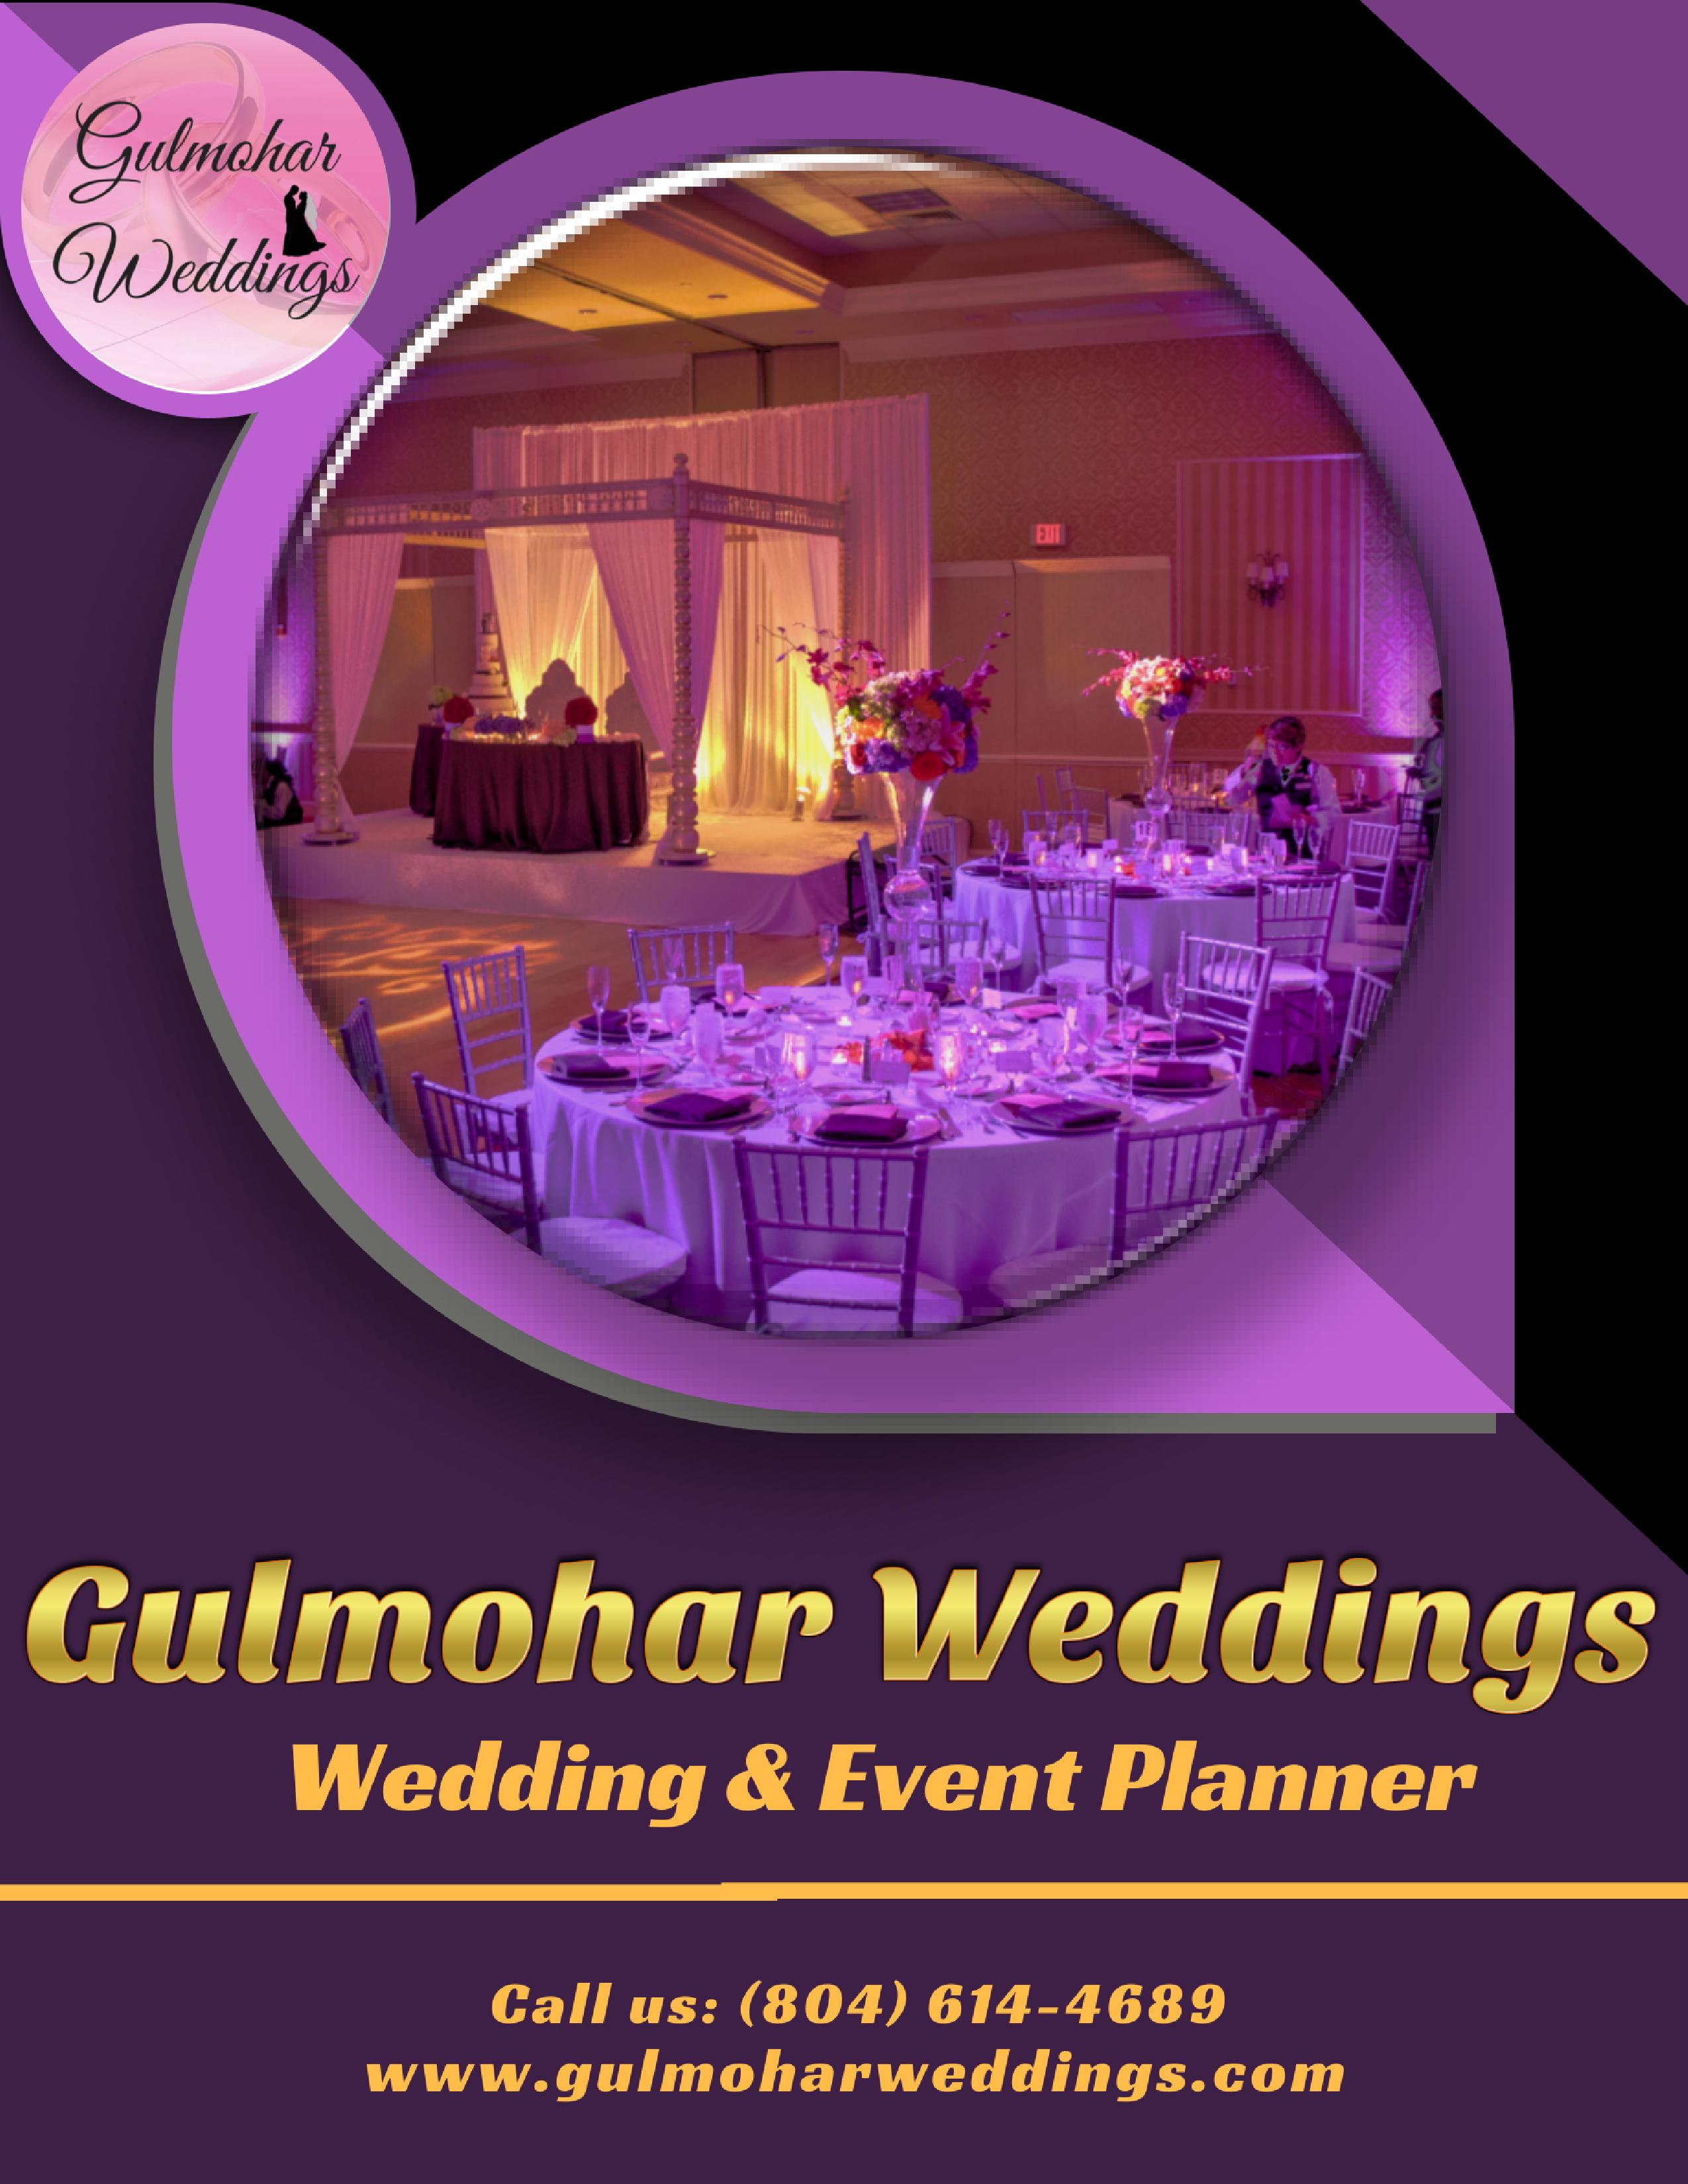 We Specialize In Mandap Decor Mehndi Sangeet Decor Reception Decor Fresh Flower Arrangem Wedding Planner Guide Wedding Planner Brand Wedding Event Planner